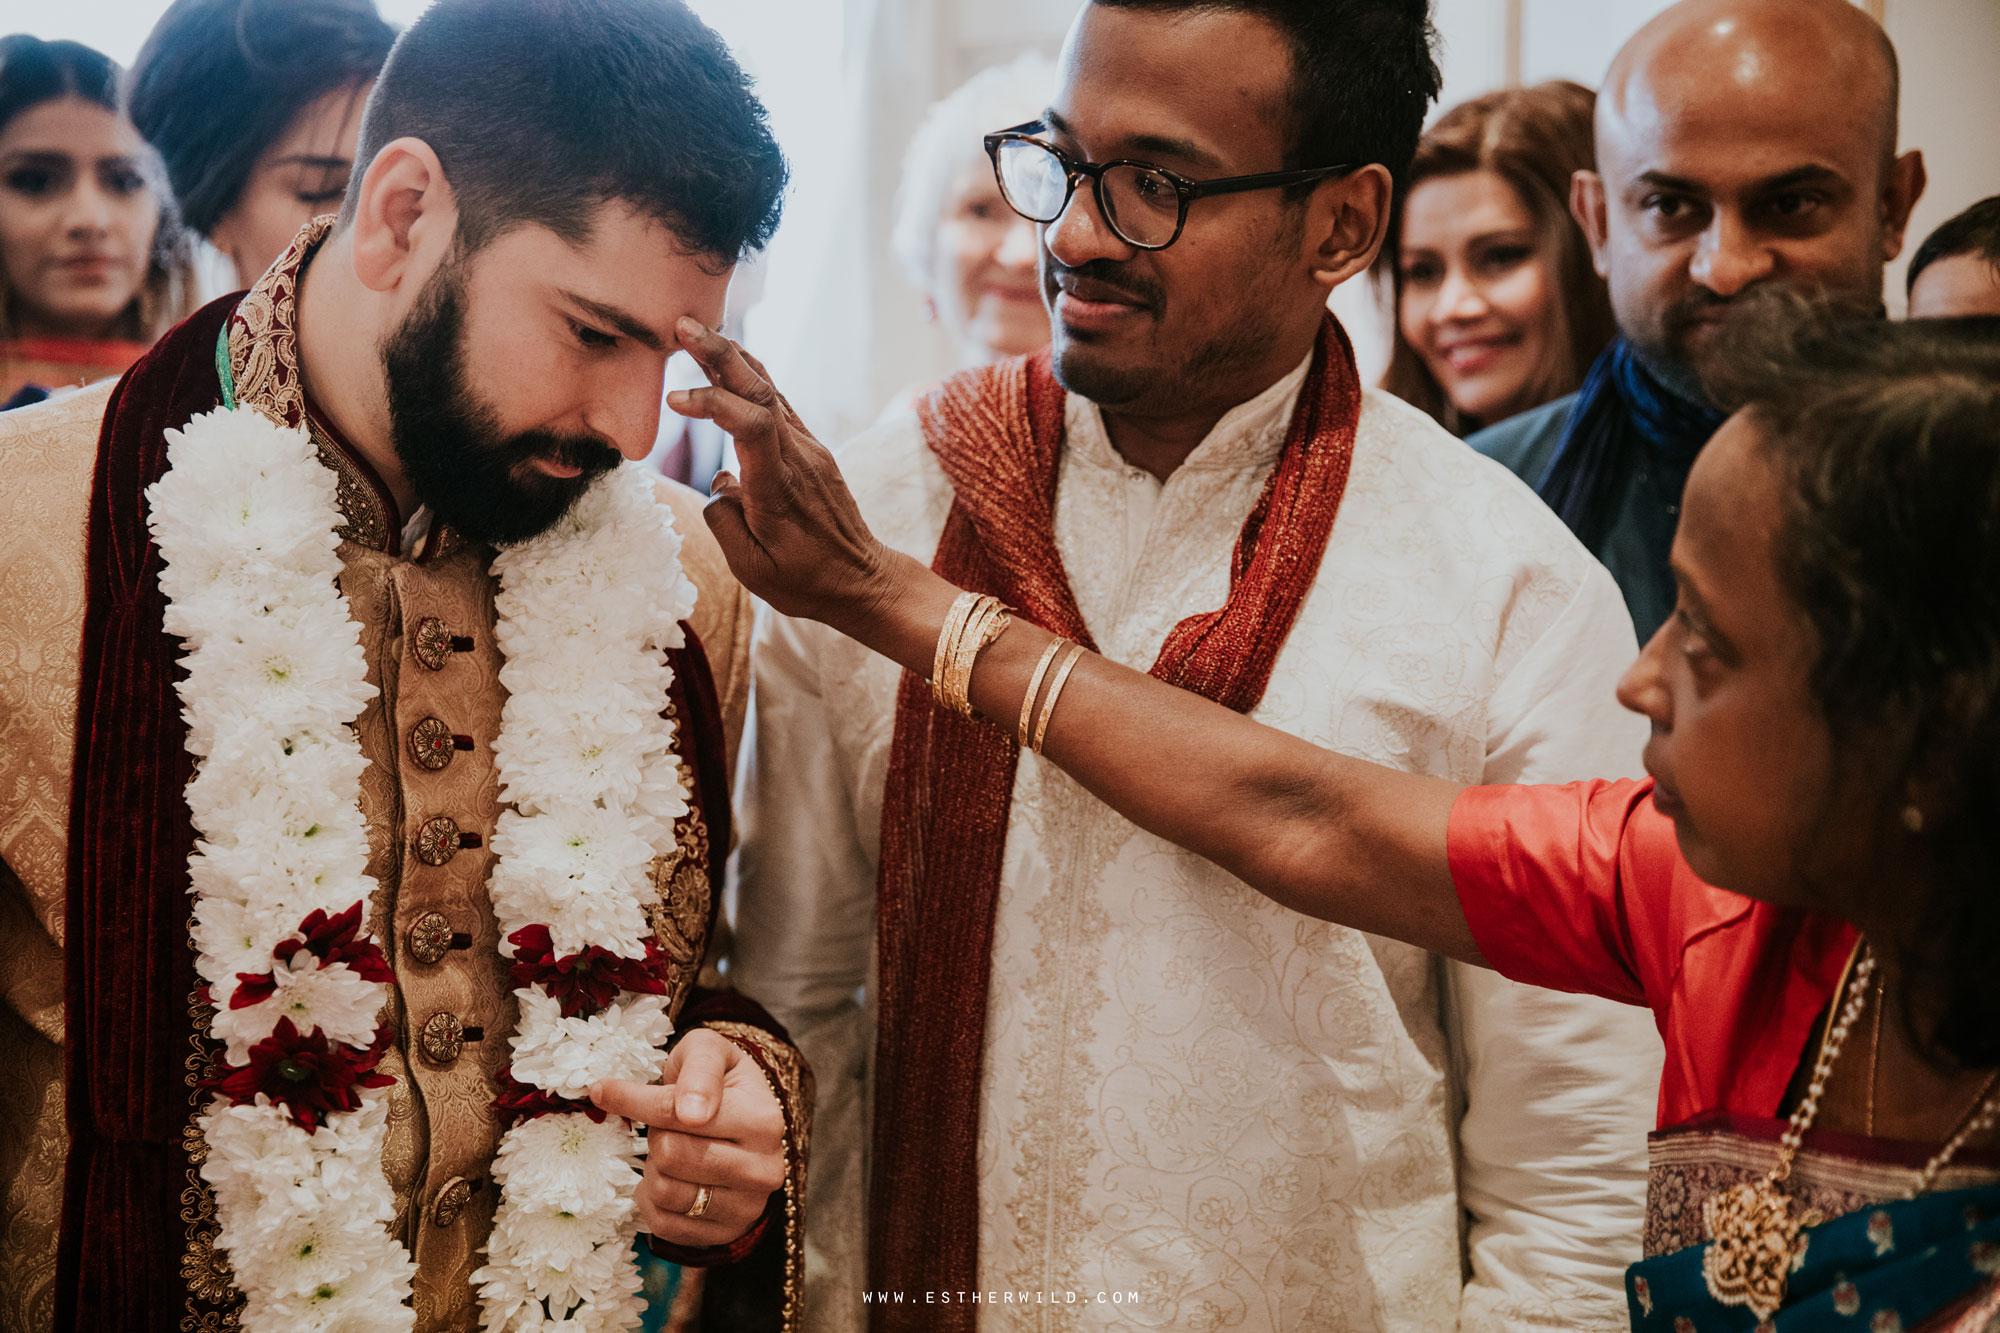 Northbrook_Park_Farnham_Surrey_London_Wedding_Hindu_Fusion_Esther_Wild_Photographer_IMG_3448.jpg